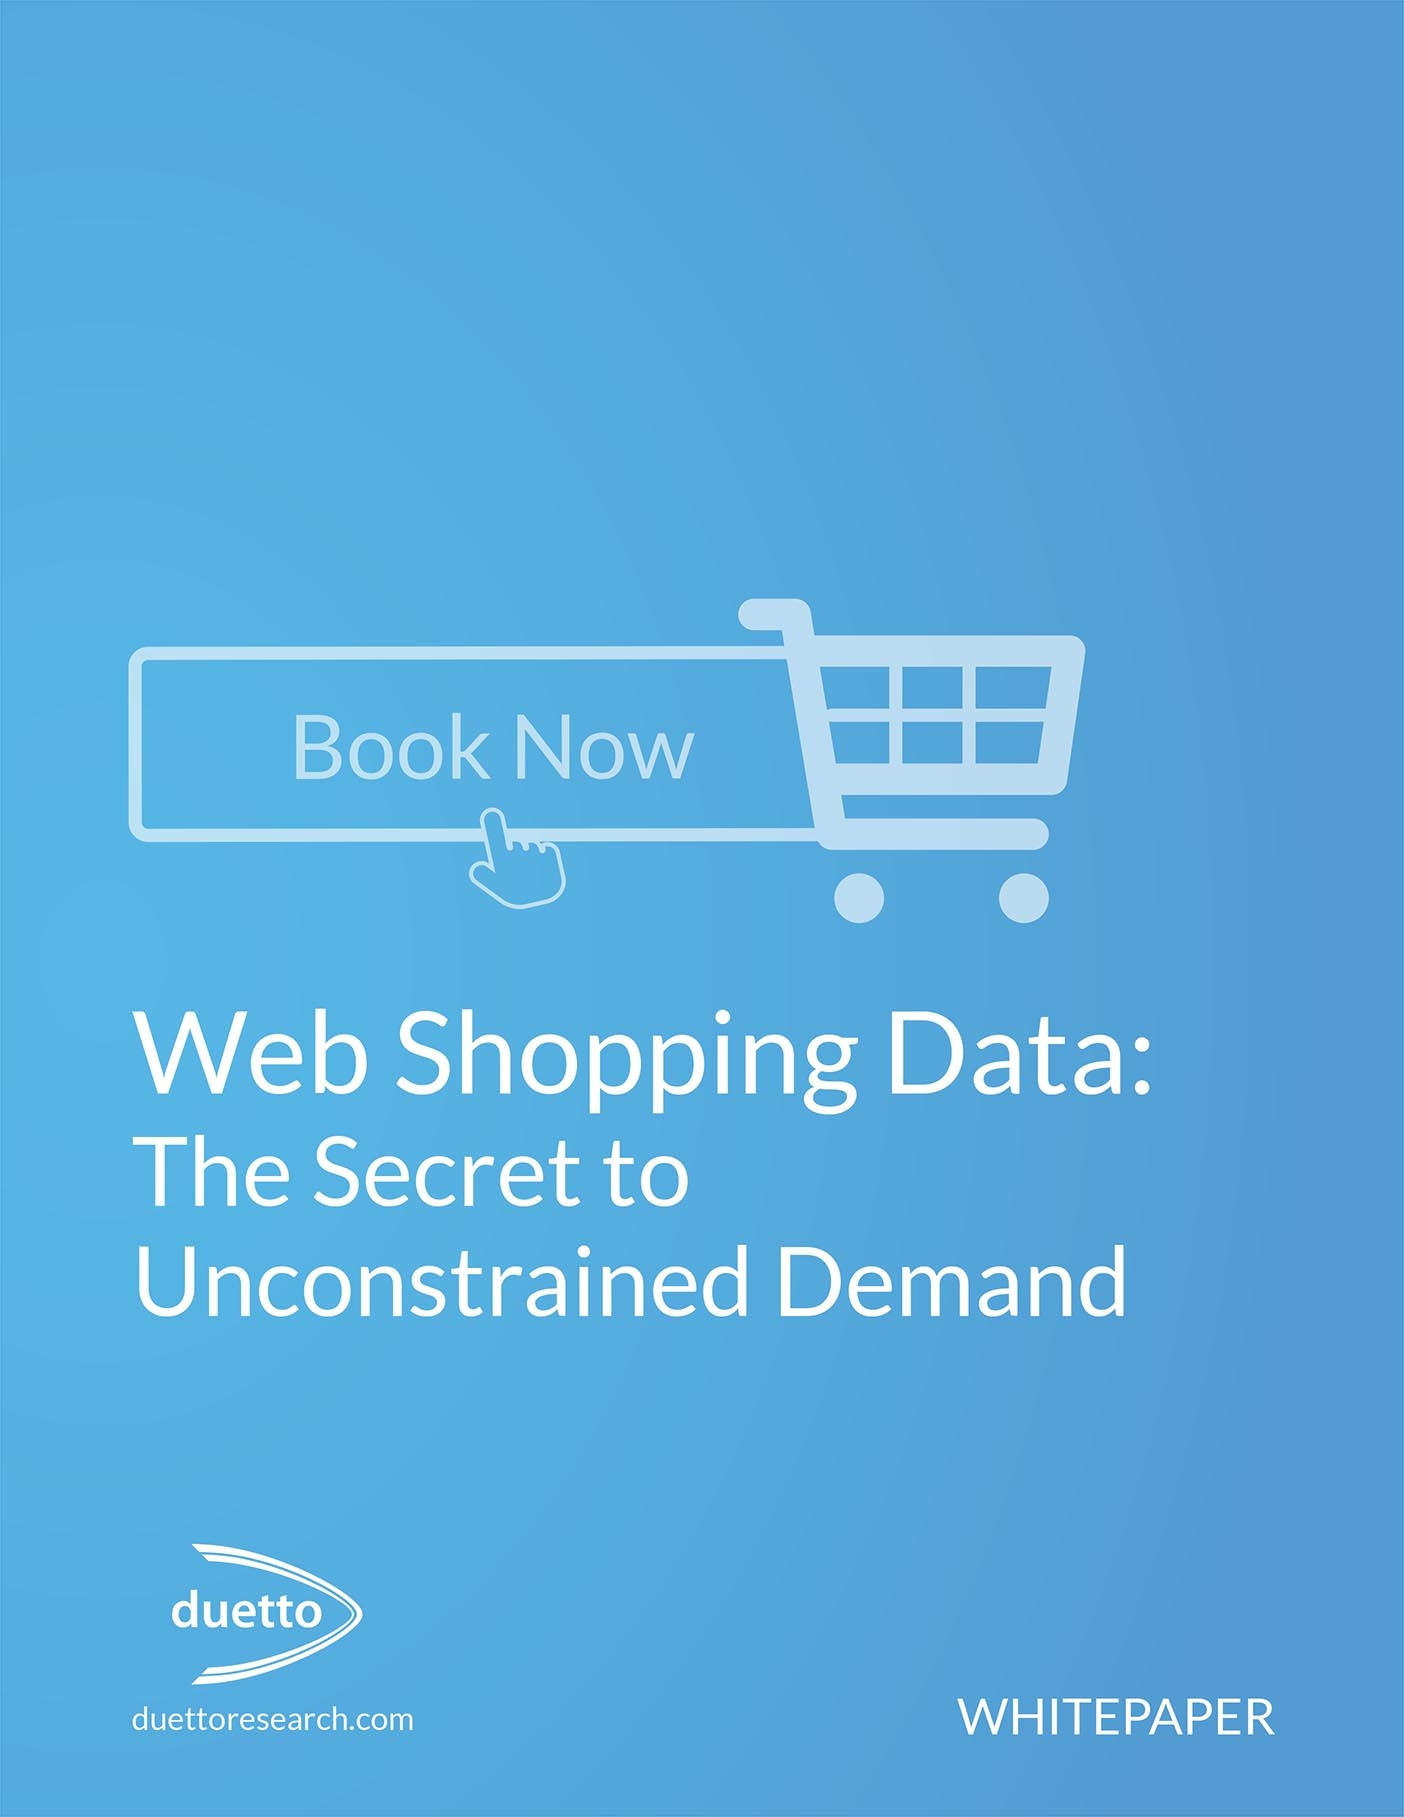 1 web-shopping-data-secret-to-unconstrained-demand-1.jpg